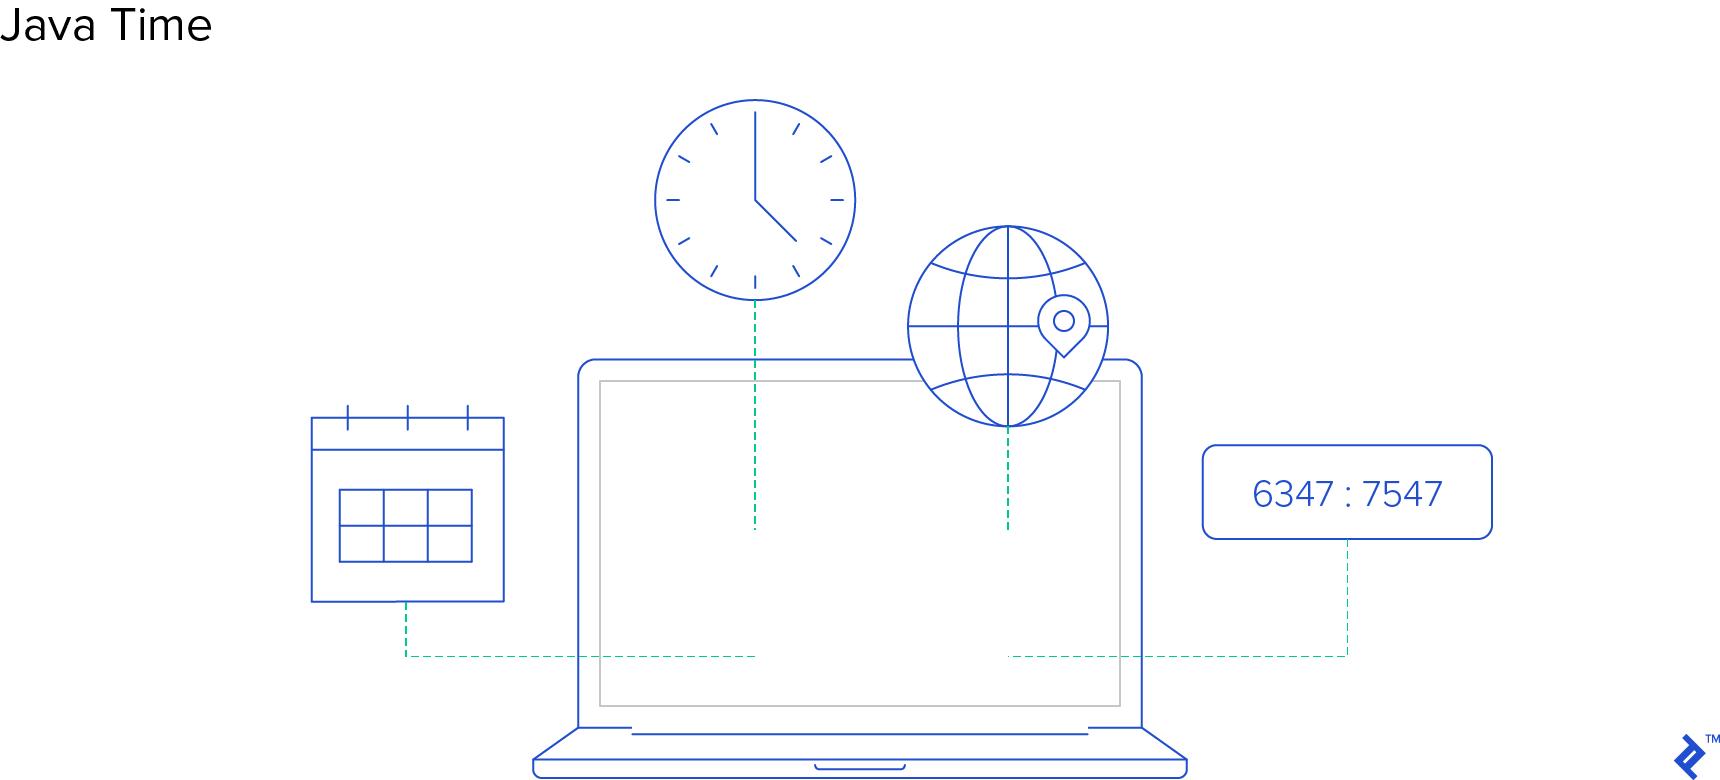 JAVA 8 TIME API